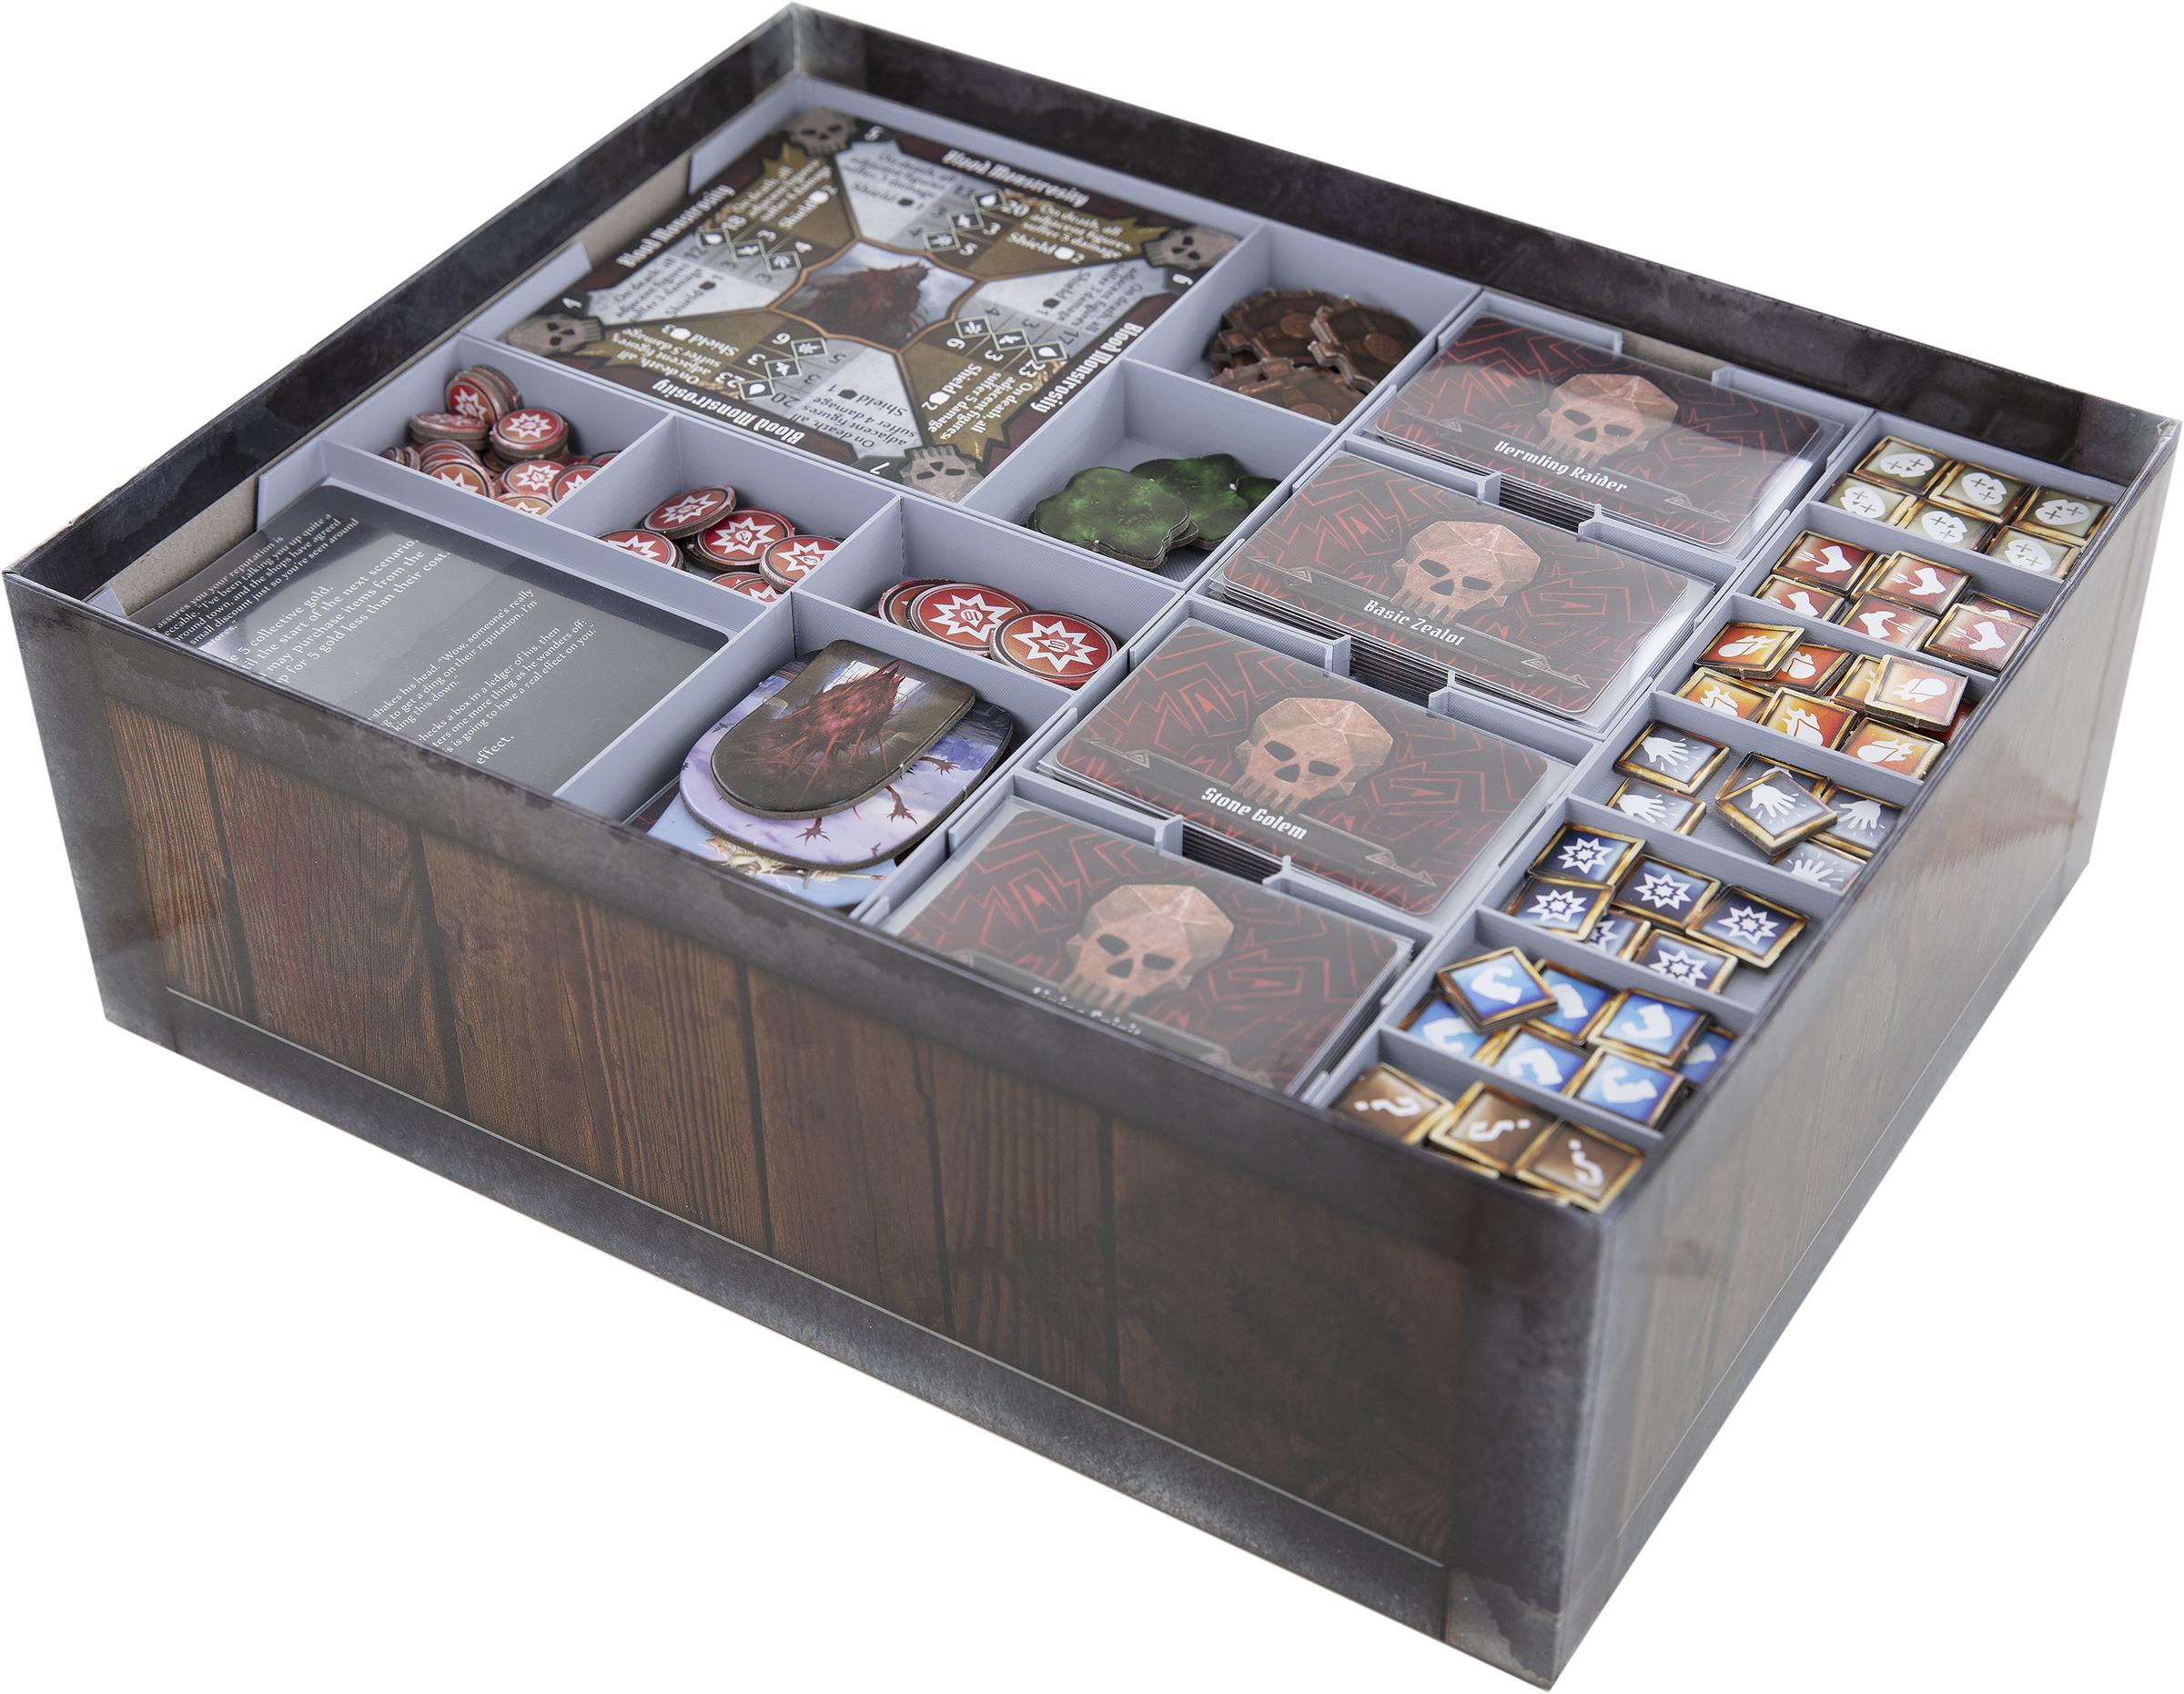 Feldherr Organizer + foam tray for Gloomhaven: Jaws of the Lion - board game box